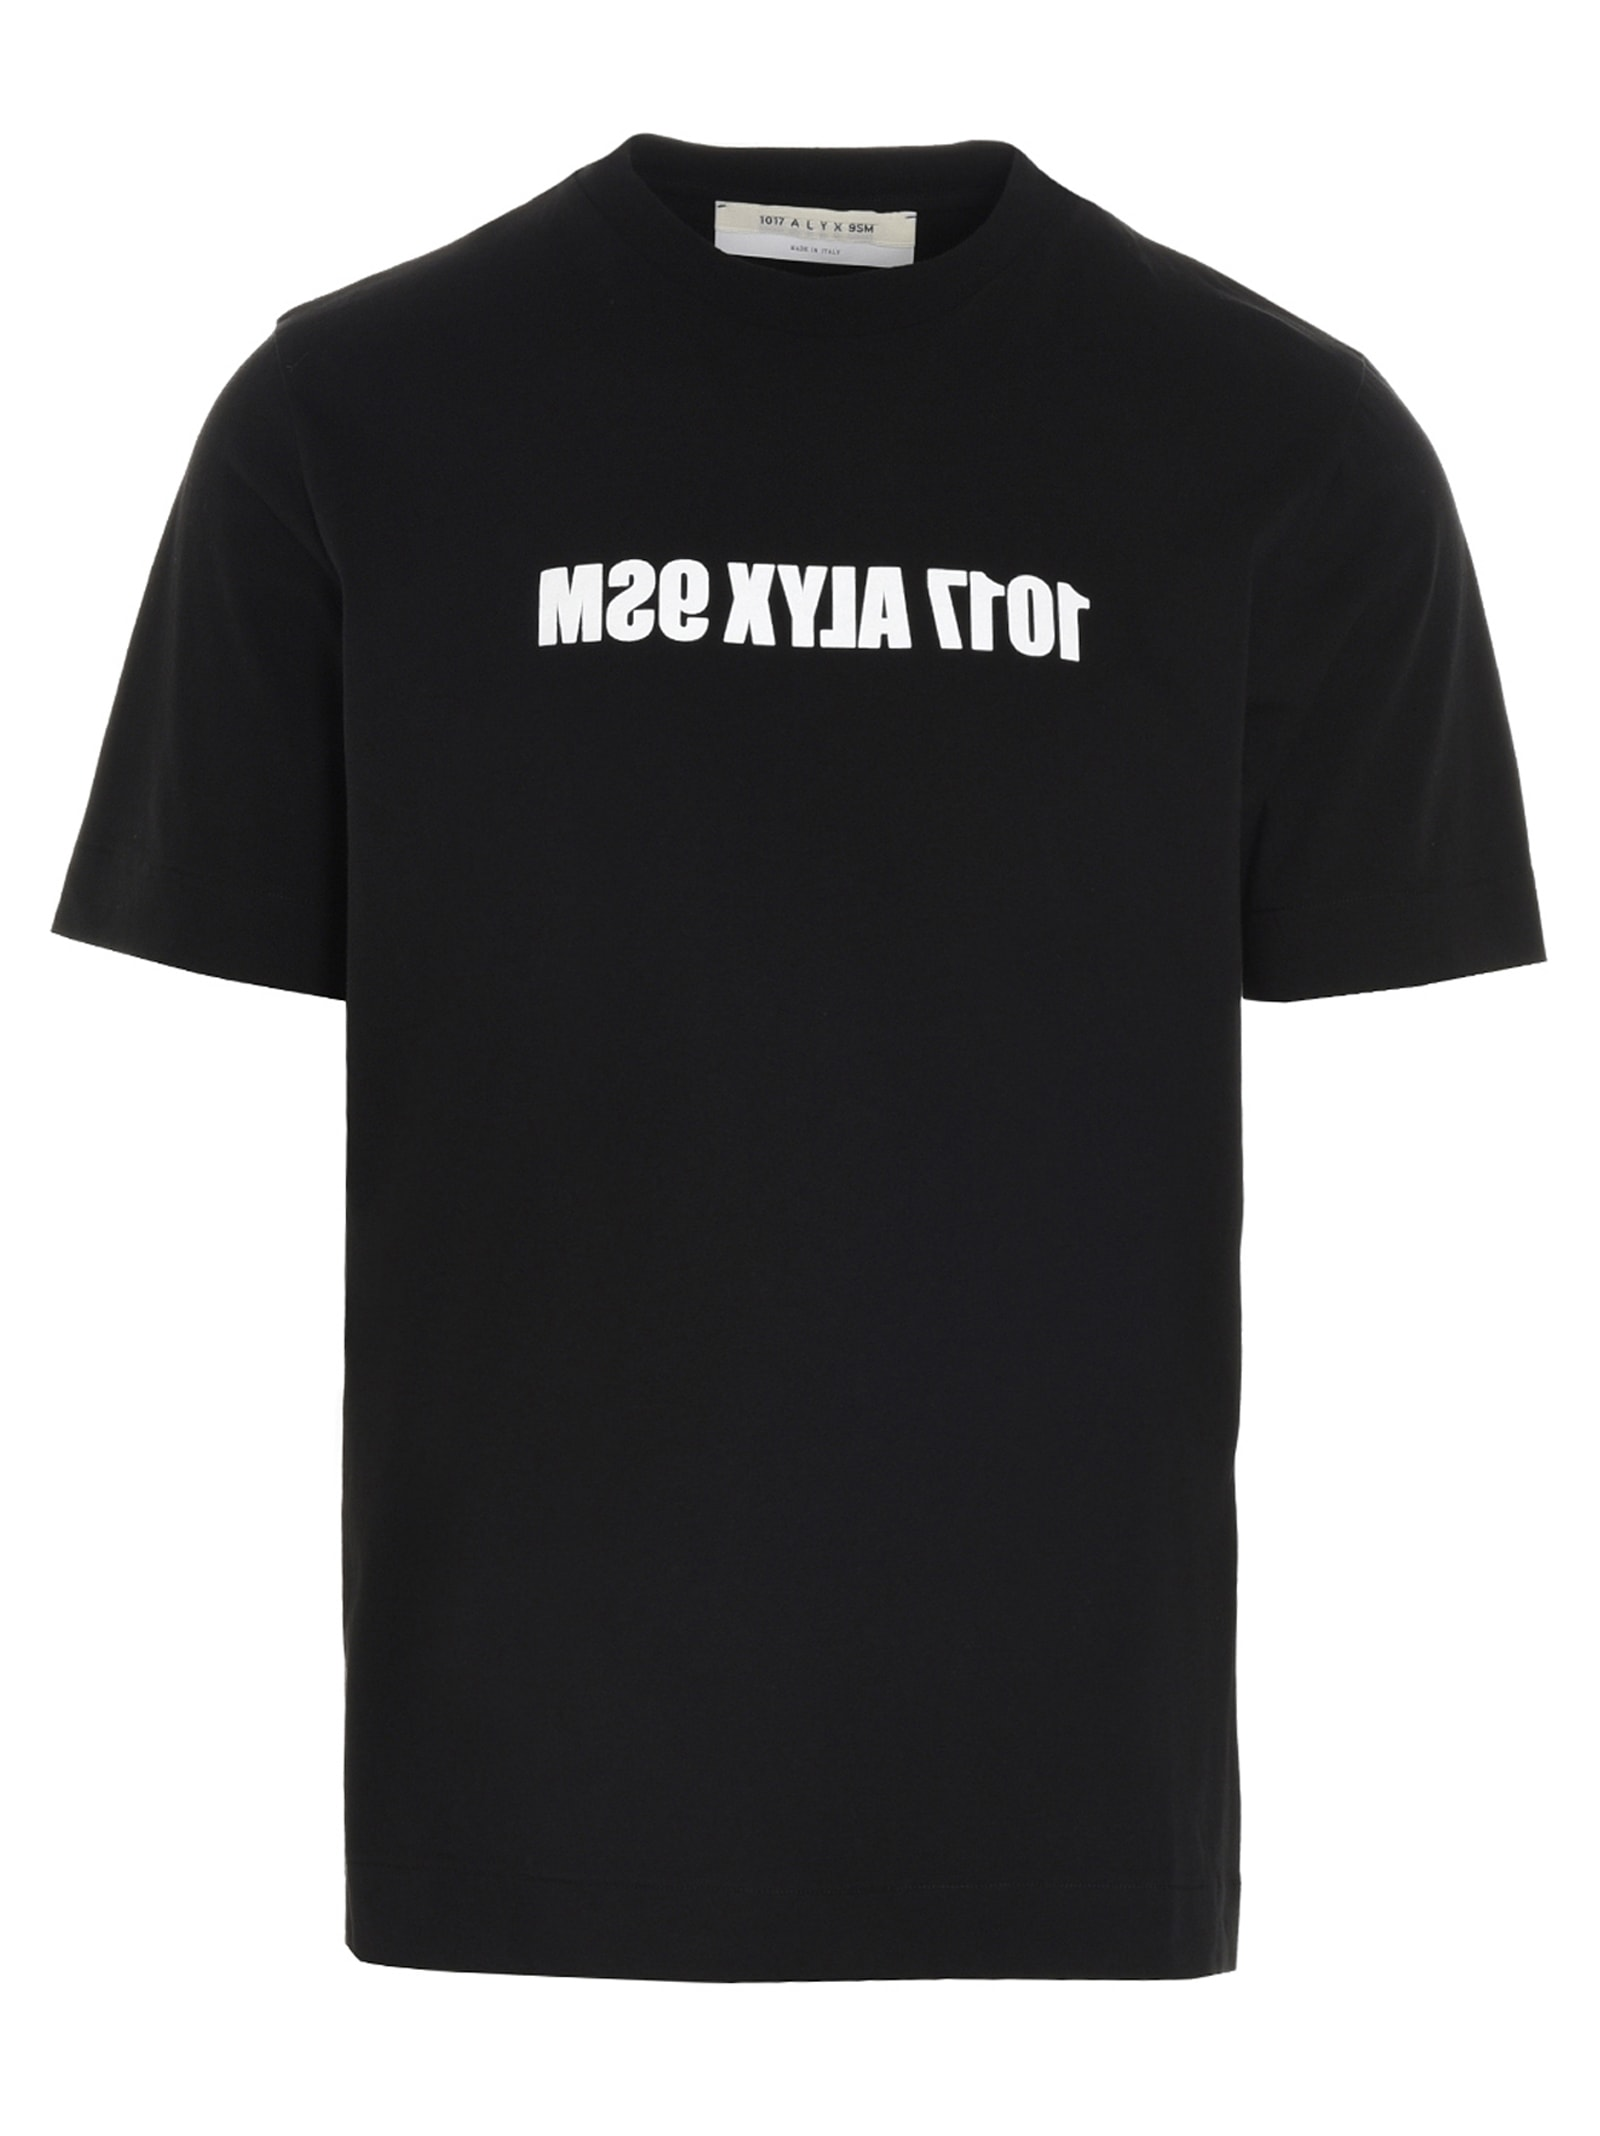 Alyx MIRROR LOGO T-SHIRT